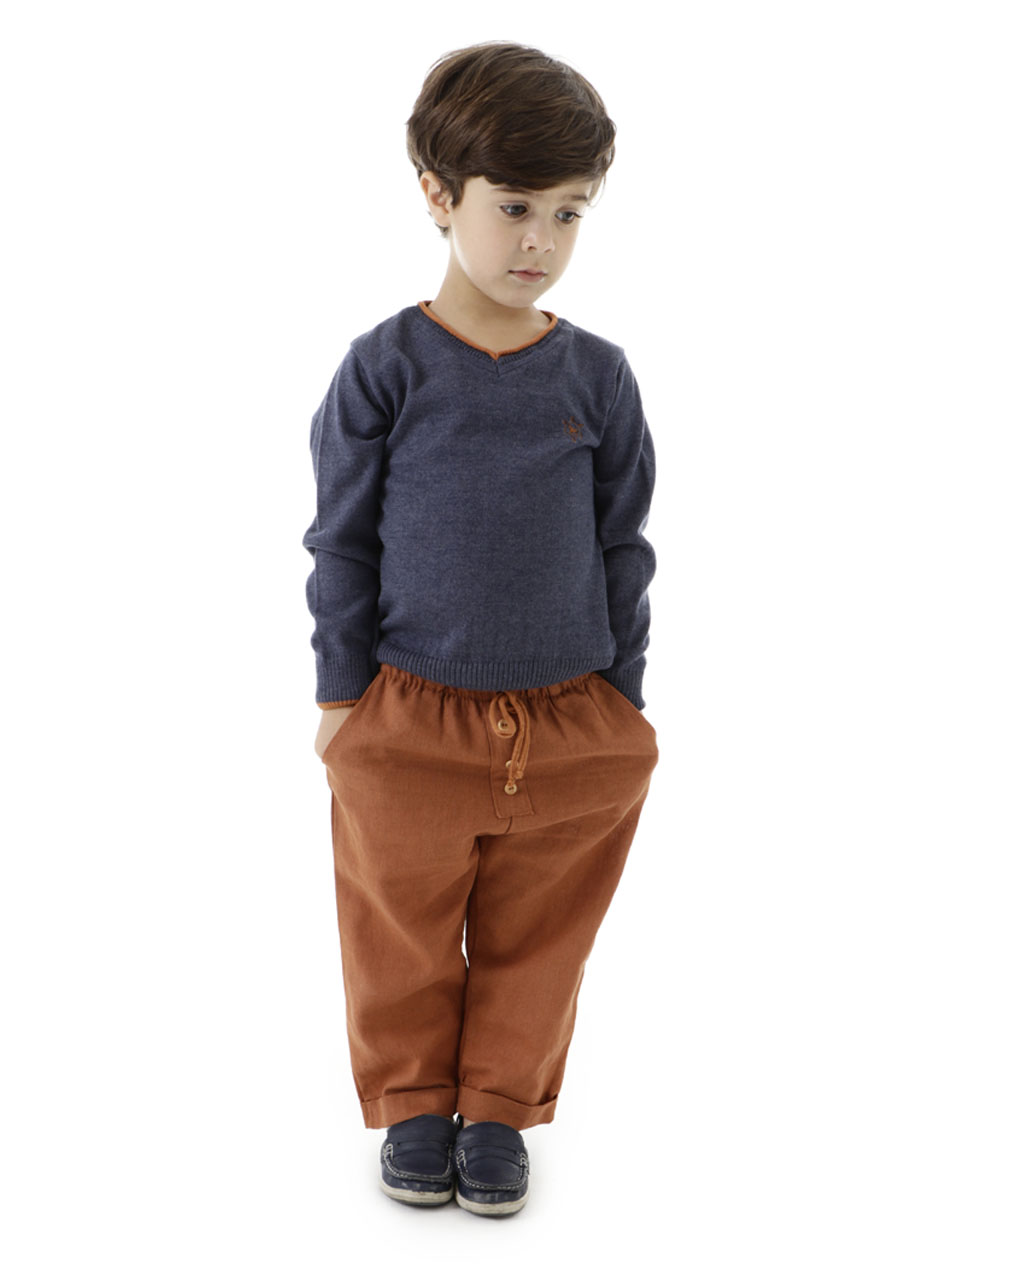 Blusa Infantil Masculina Tricô Mescla Cinza Detalhe Gola Mini Lady